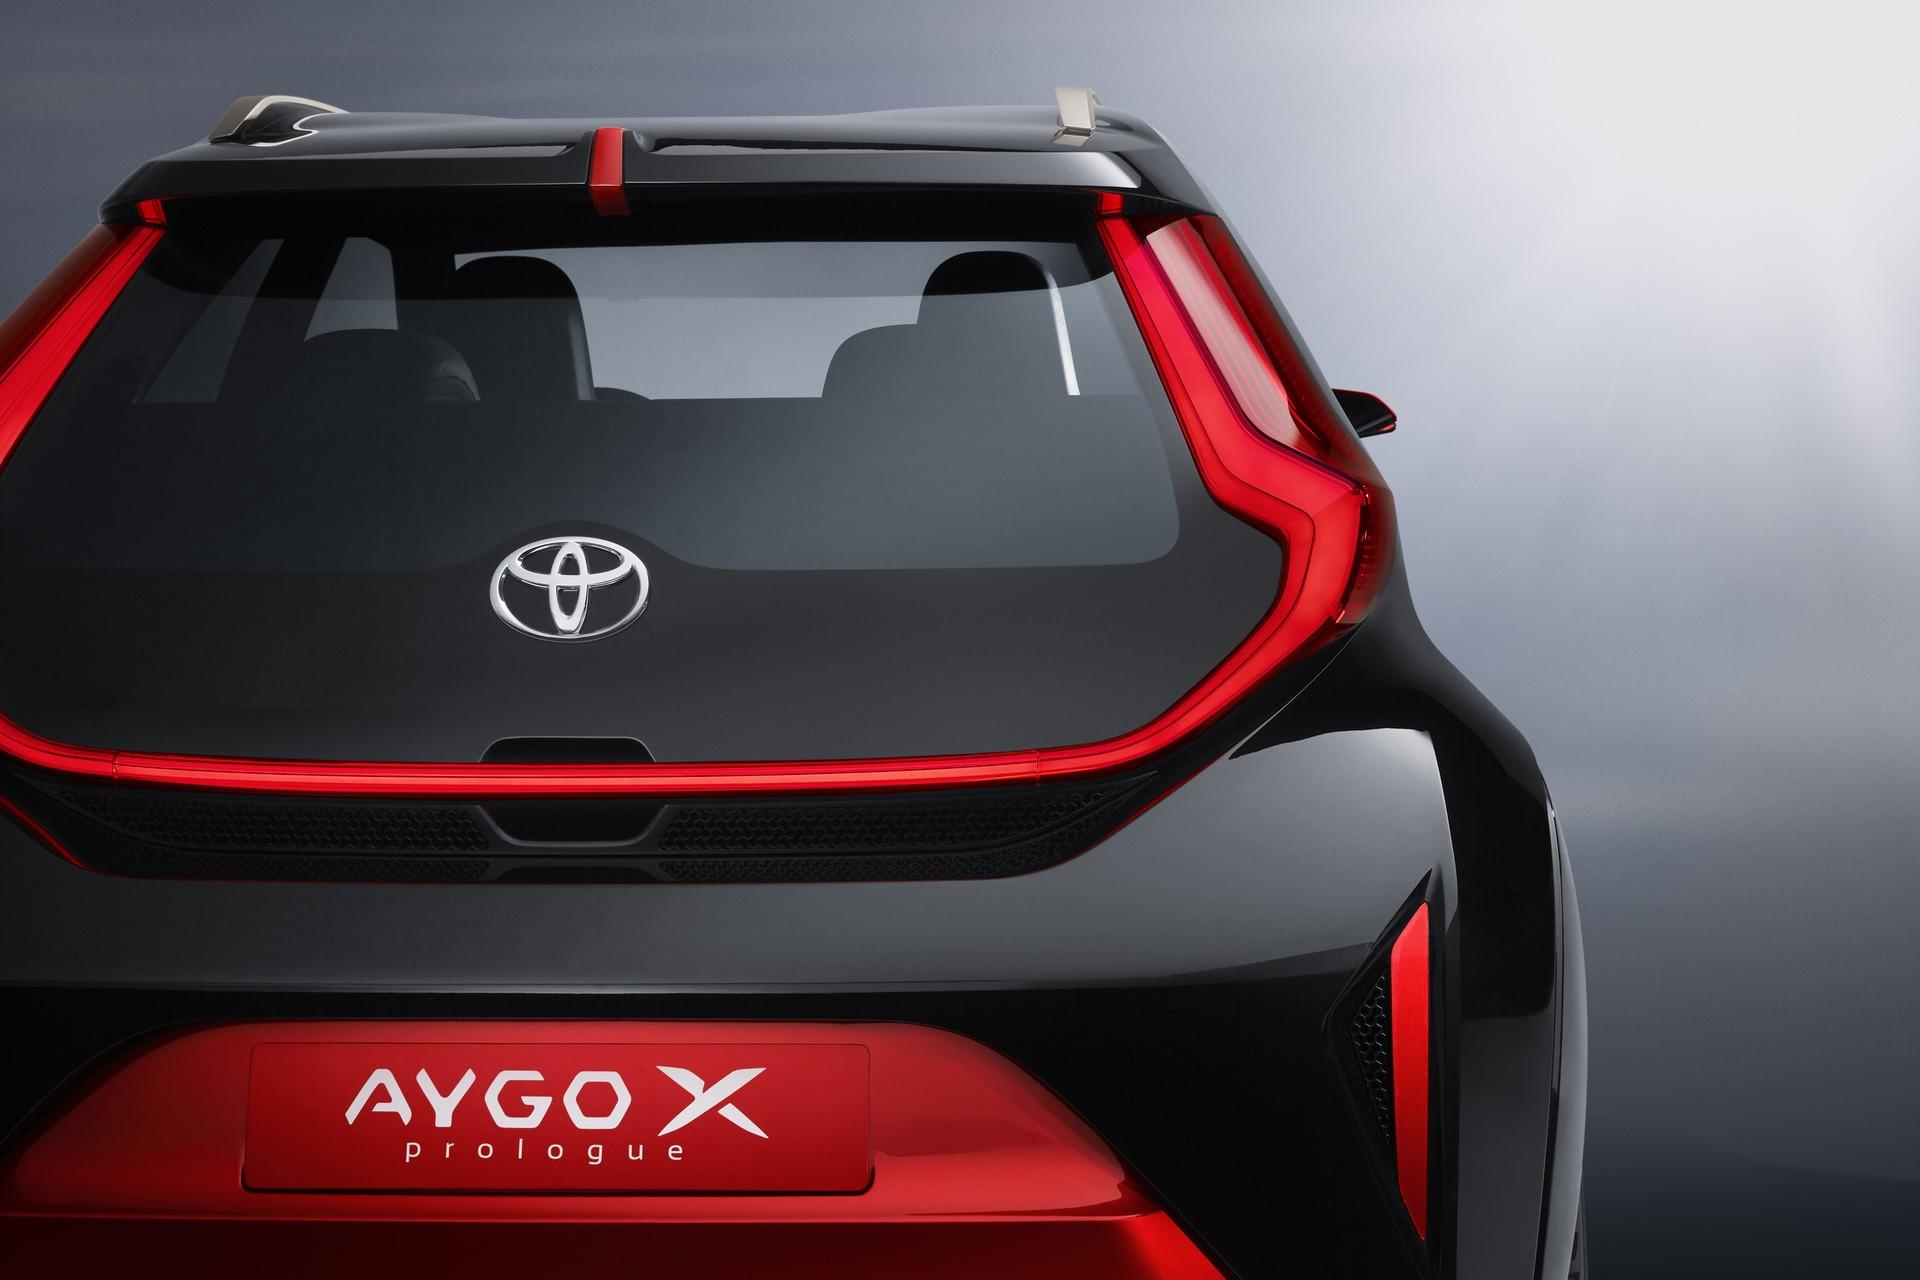 Toyota_Aygo_X_prologue-0034